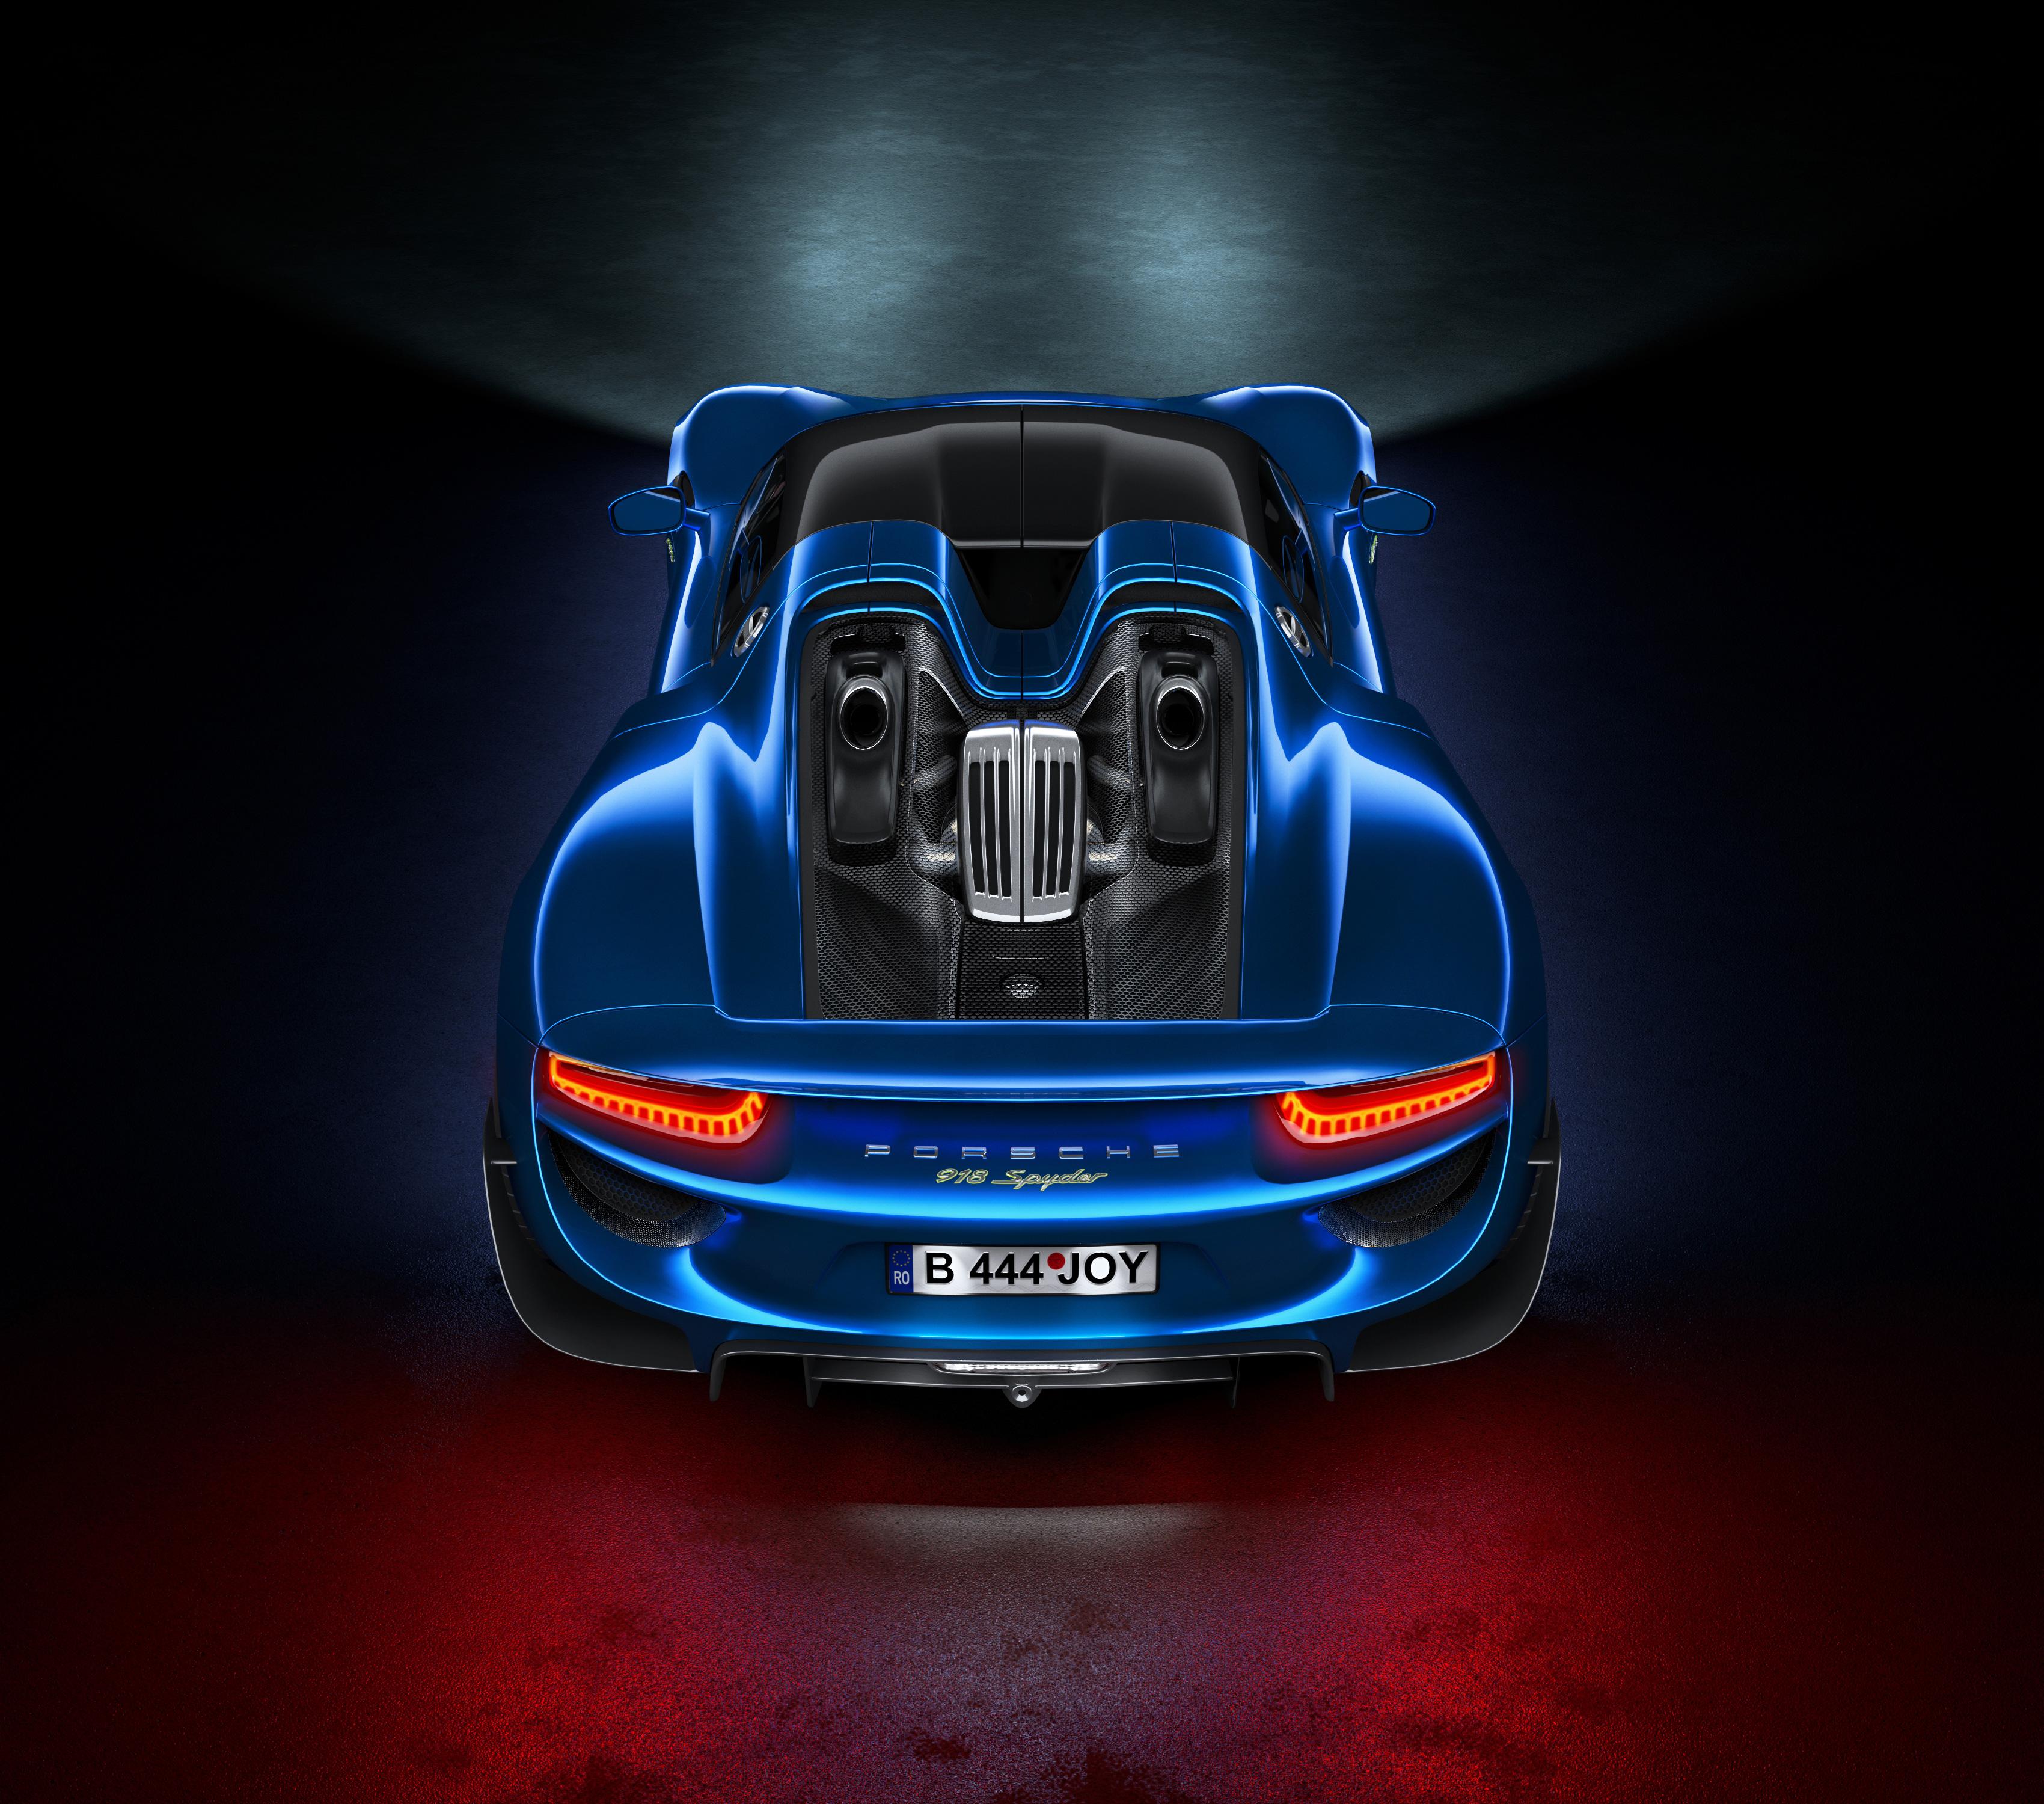 Porsche 918 Hybrid, HD Cars, 4k Wallpapers, Images